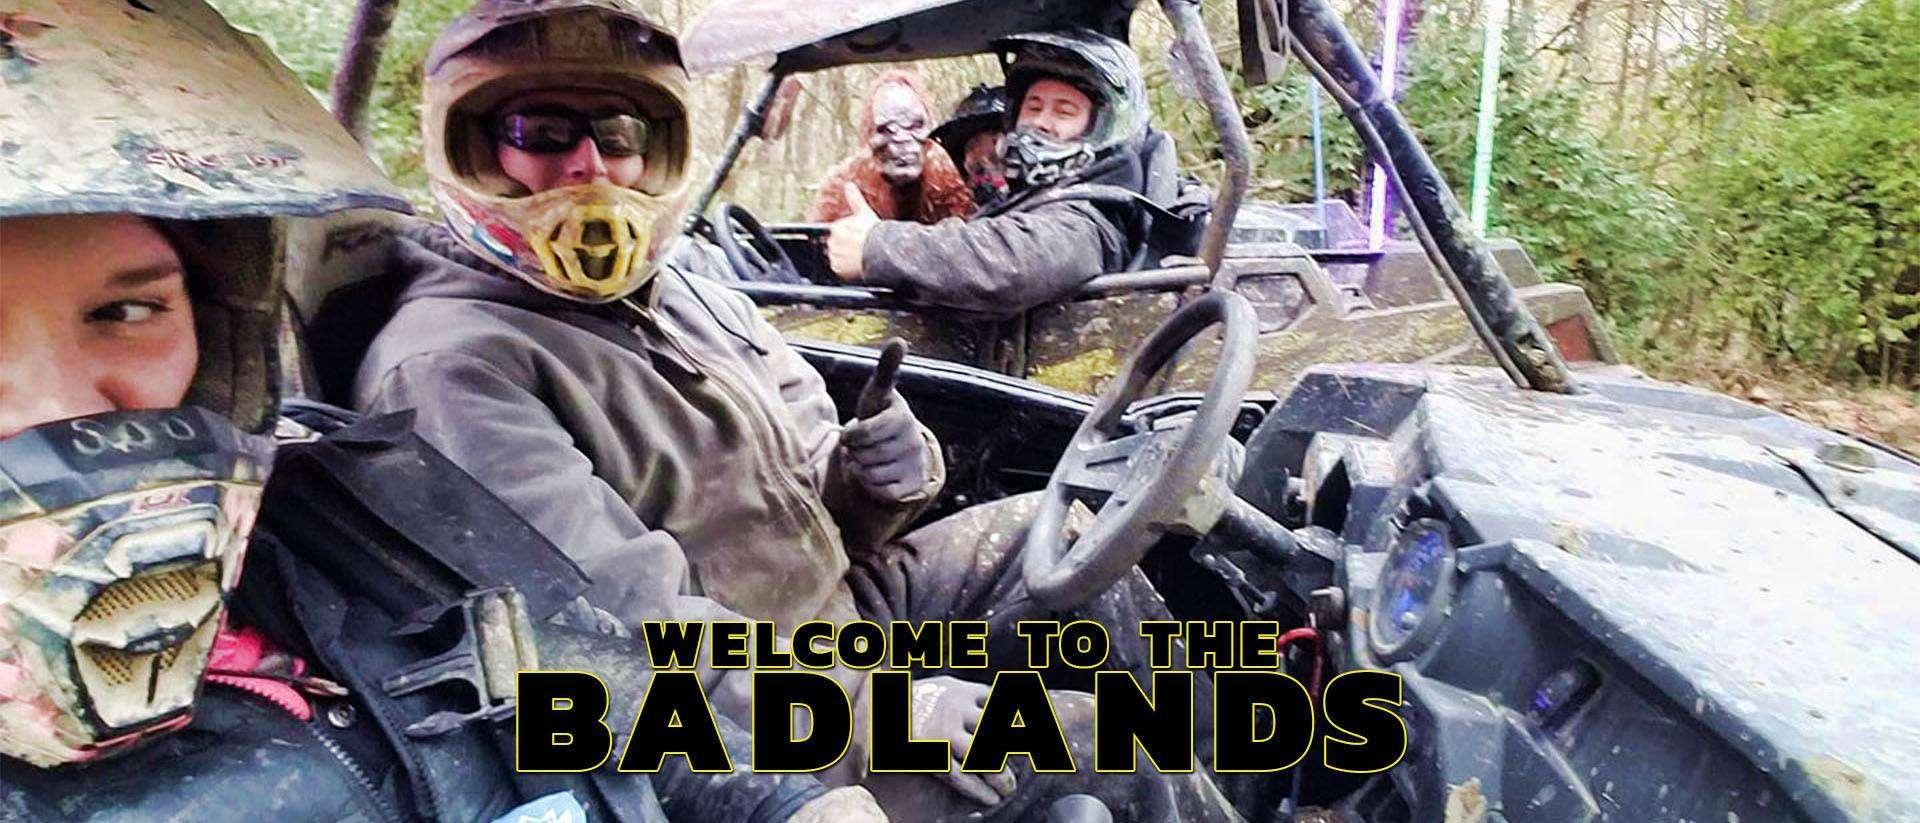 Badlands Off Road Park is located in Attica, IN | Explore the Badlands!